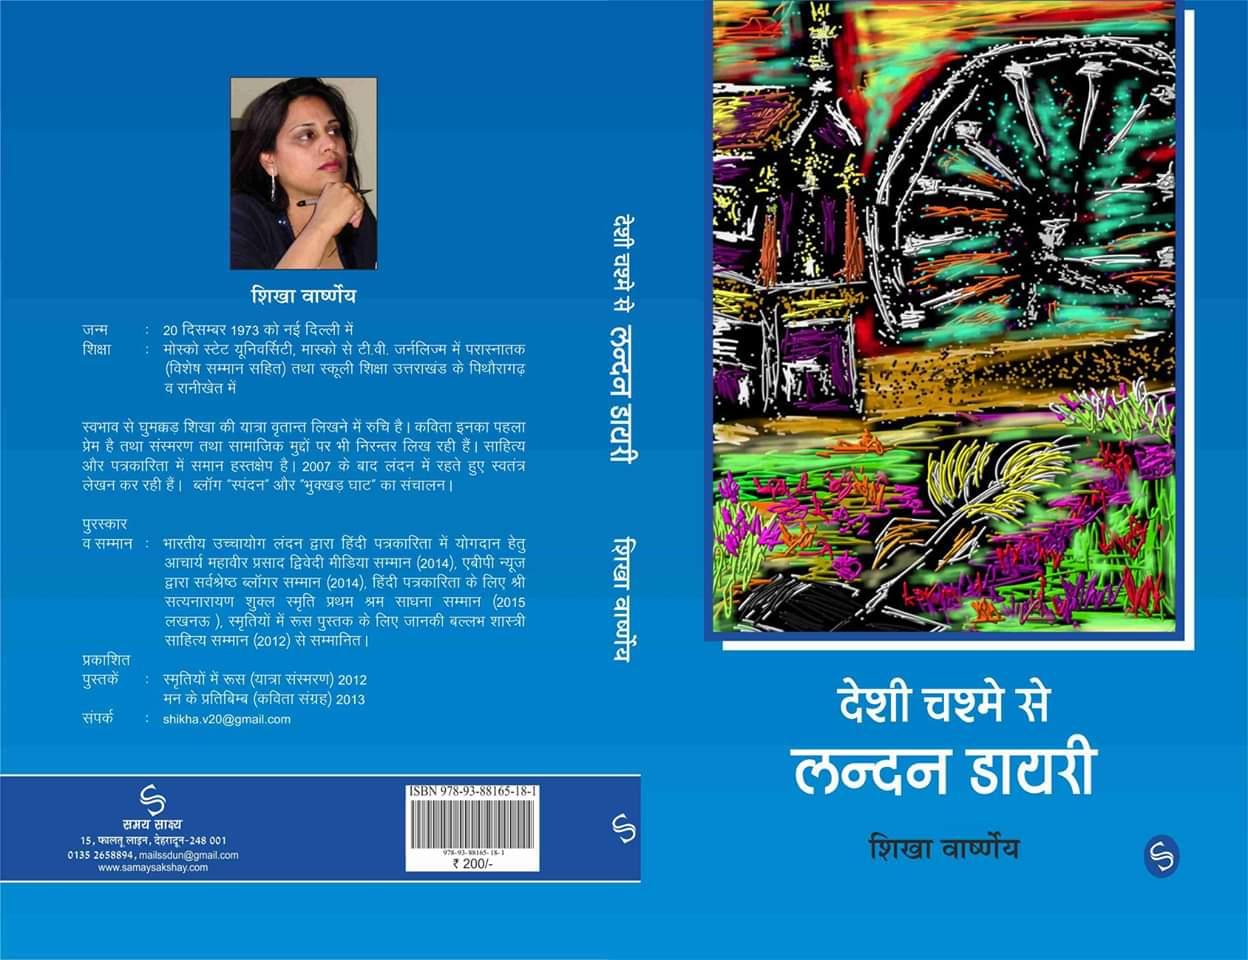 Deshi Chashme Se London Diary. देशी चश्मे से लन्दन डायरी